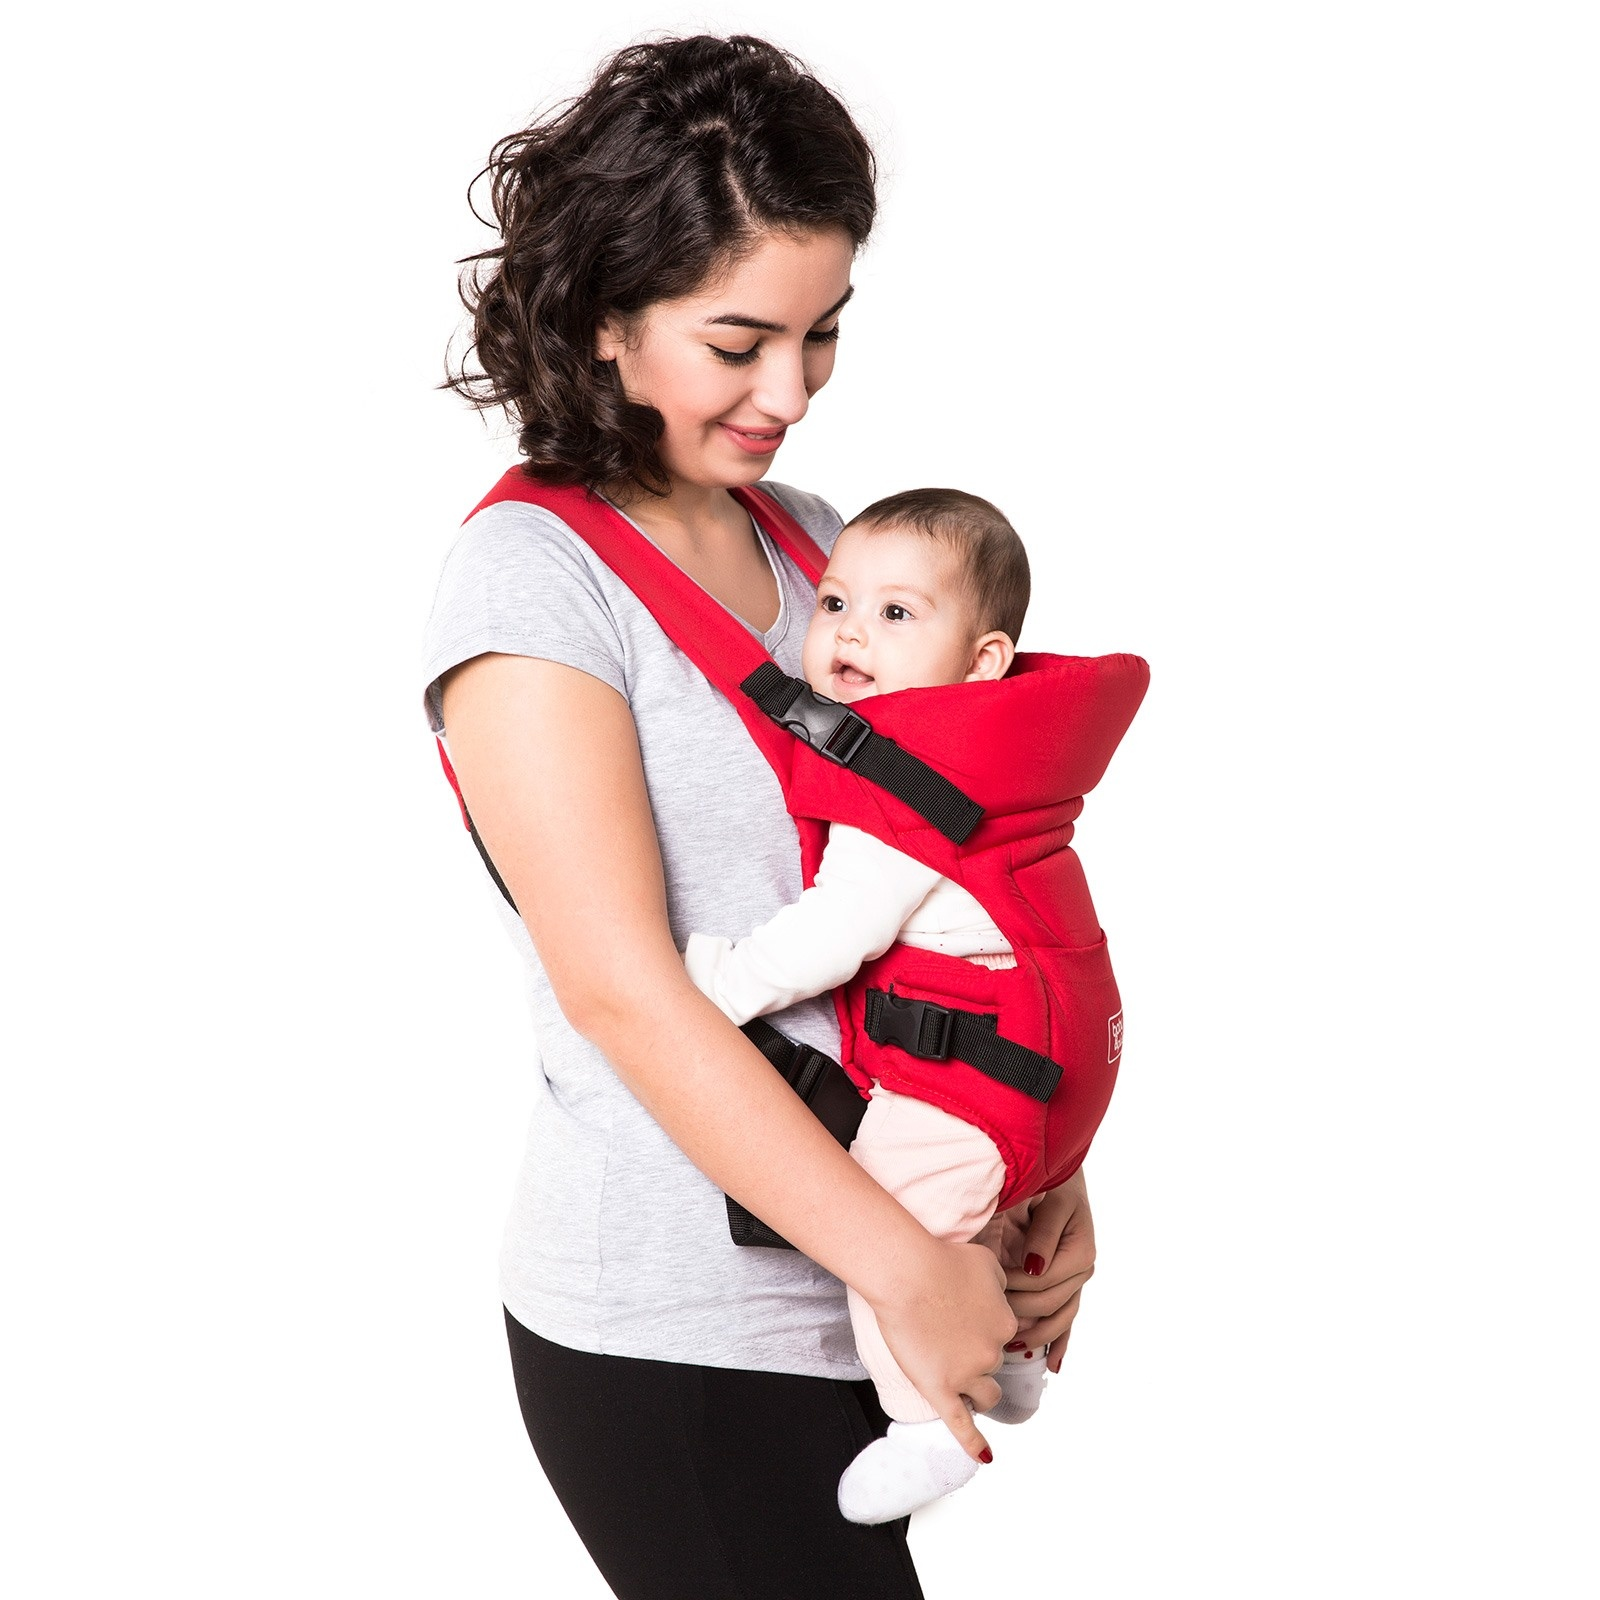 Ebebek Baby&plus Balance Comfortable Baby Kangaroo Carrier Ergonomic Baby Carrier Sling Hipseat Baby Carries Sling For Newborns